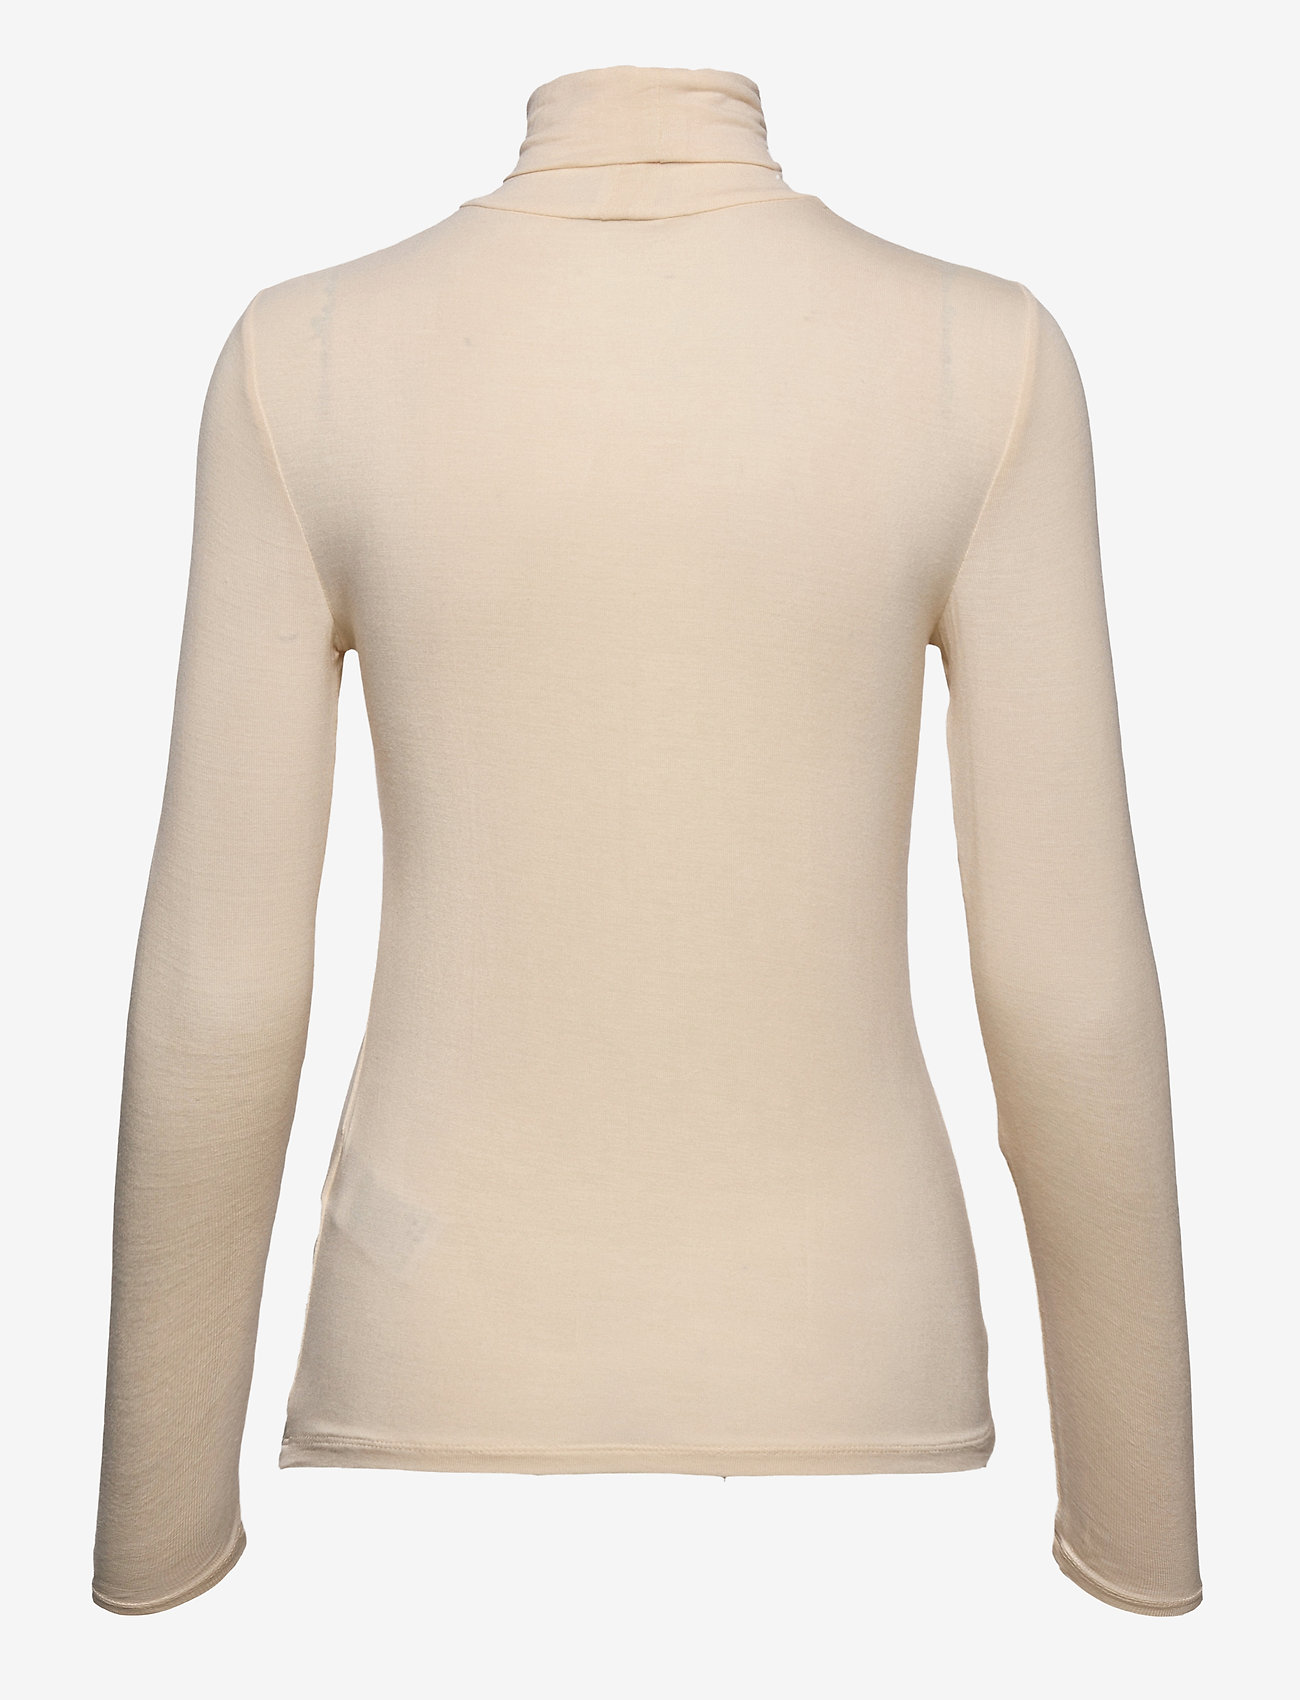 ICHI - IHPHILUCA LS - t-shirt & tops - tapioca - 1